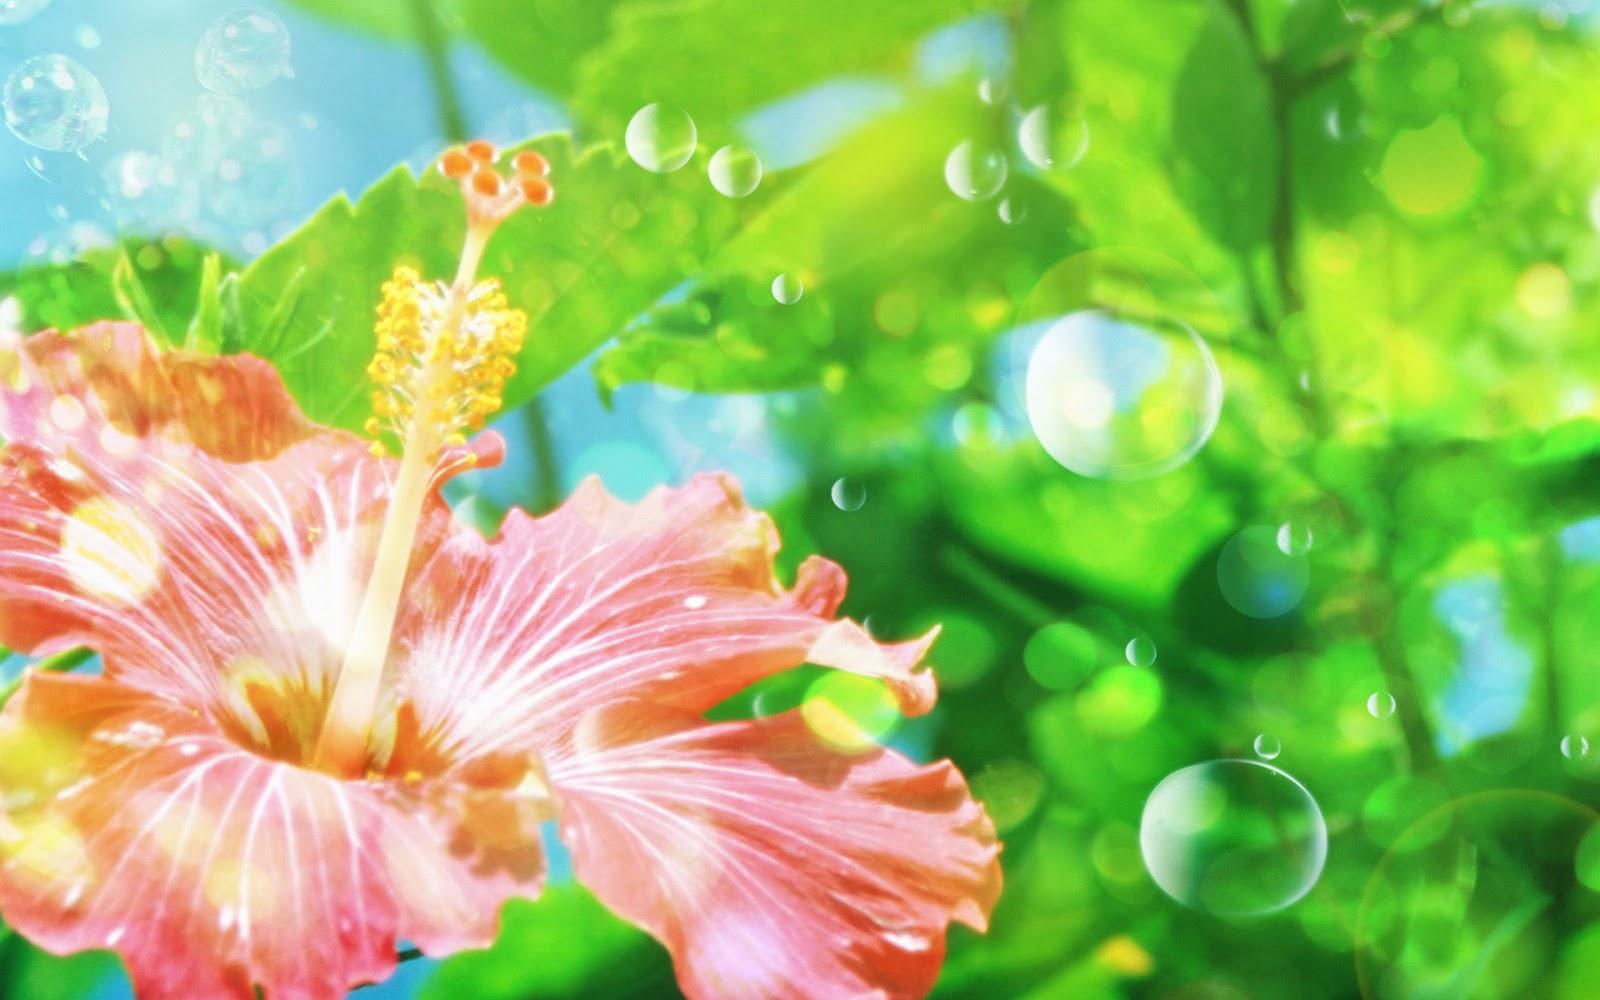 Koleksi Wallpaper Animasi Bunga Agatha Adkins